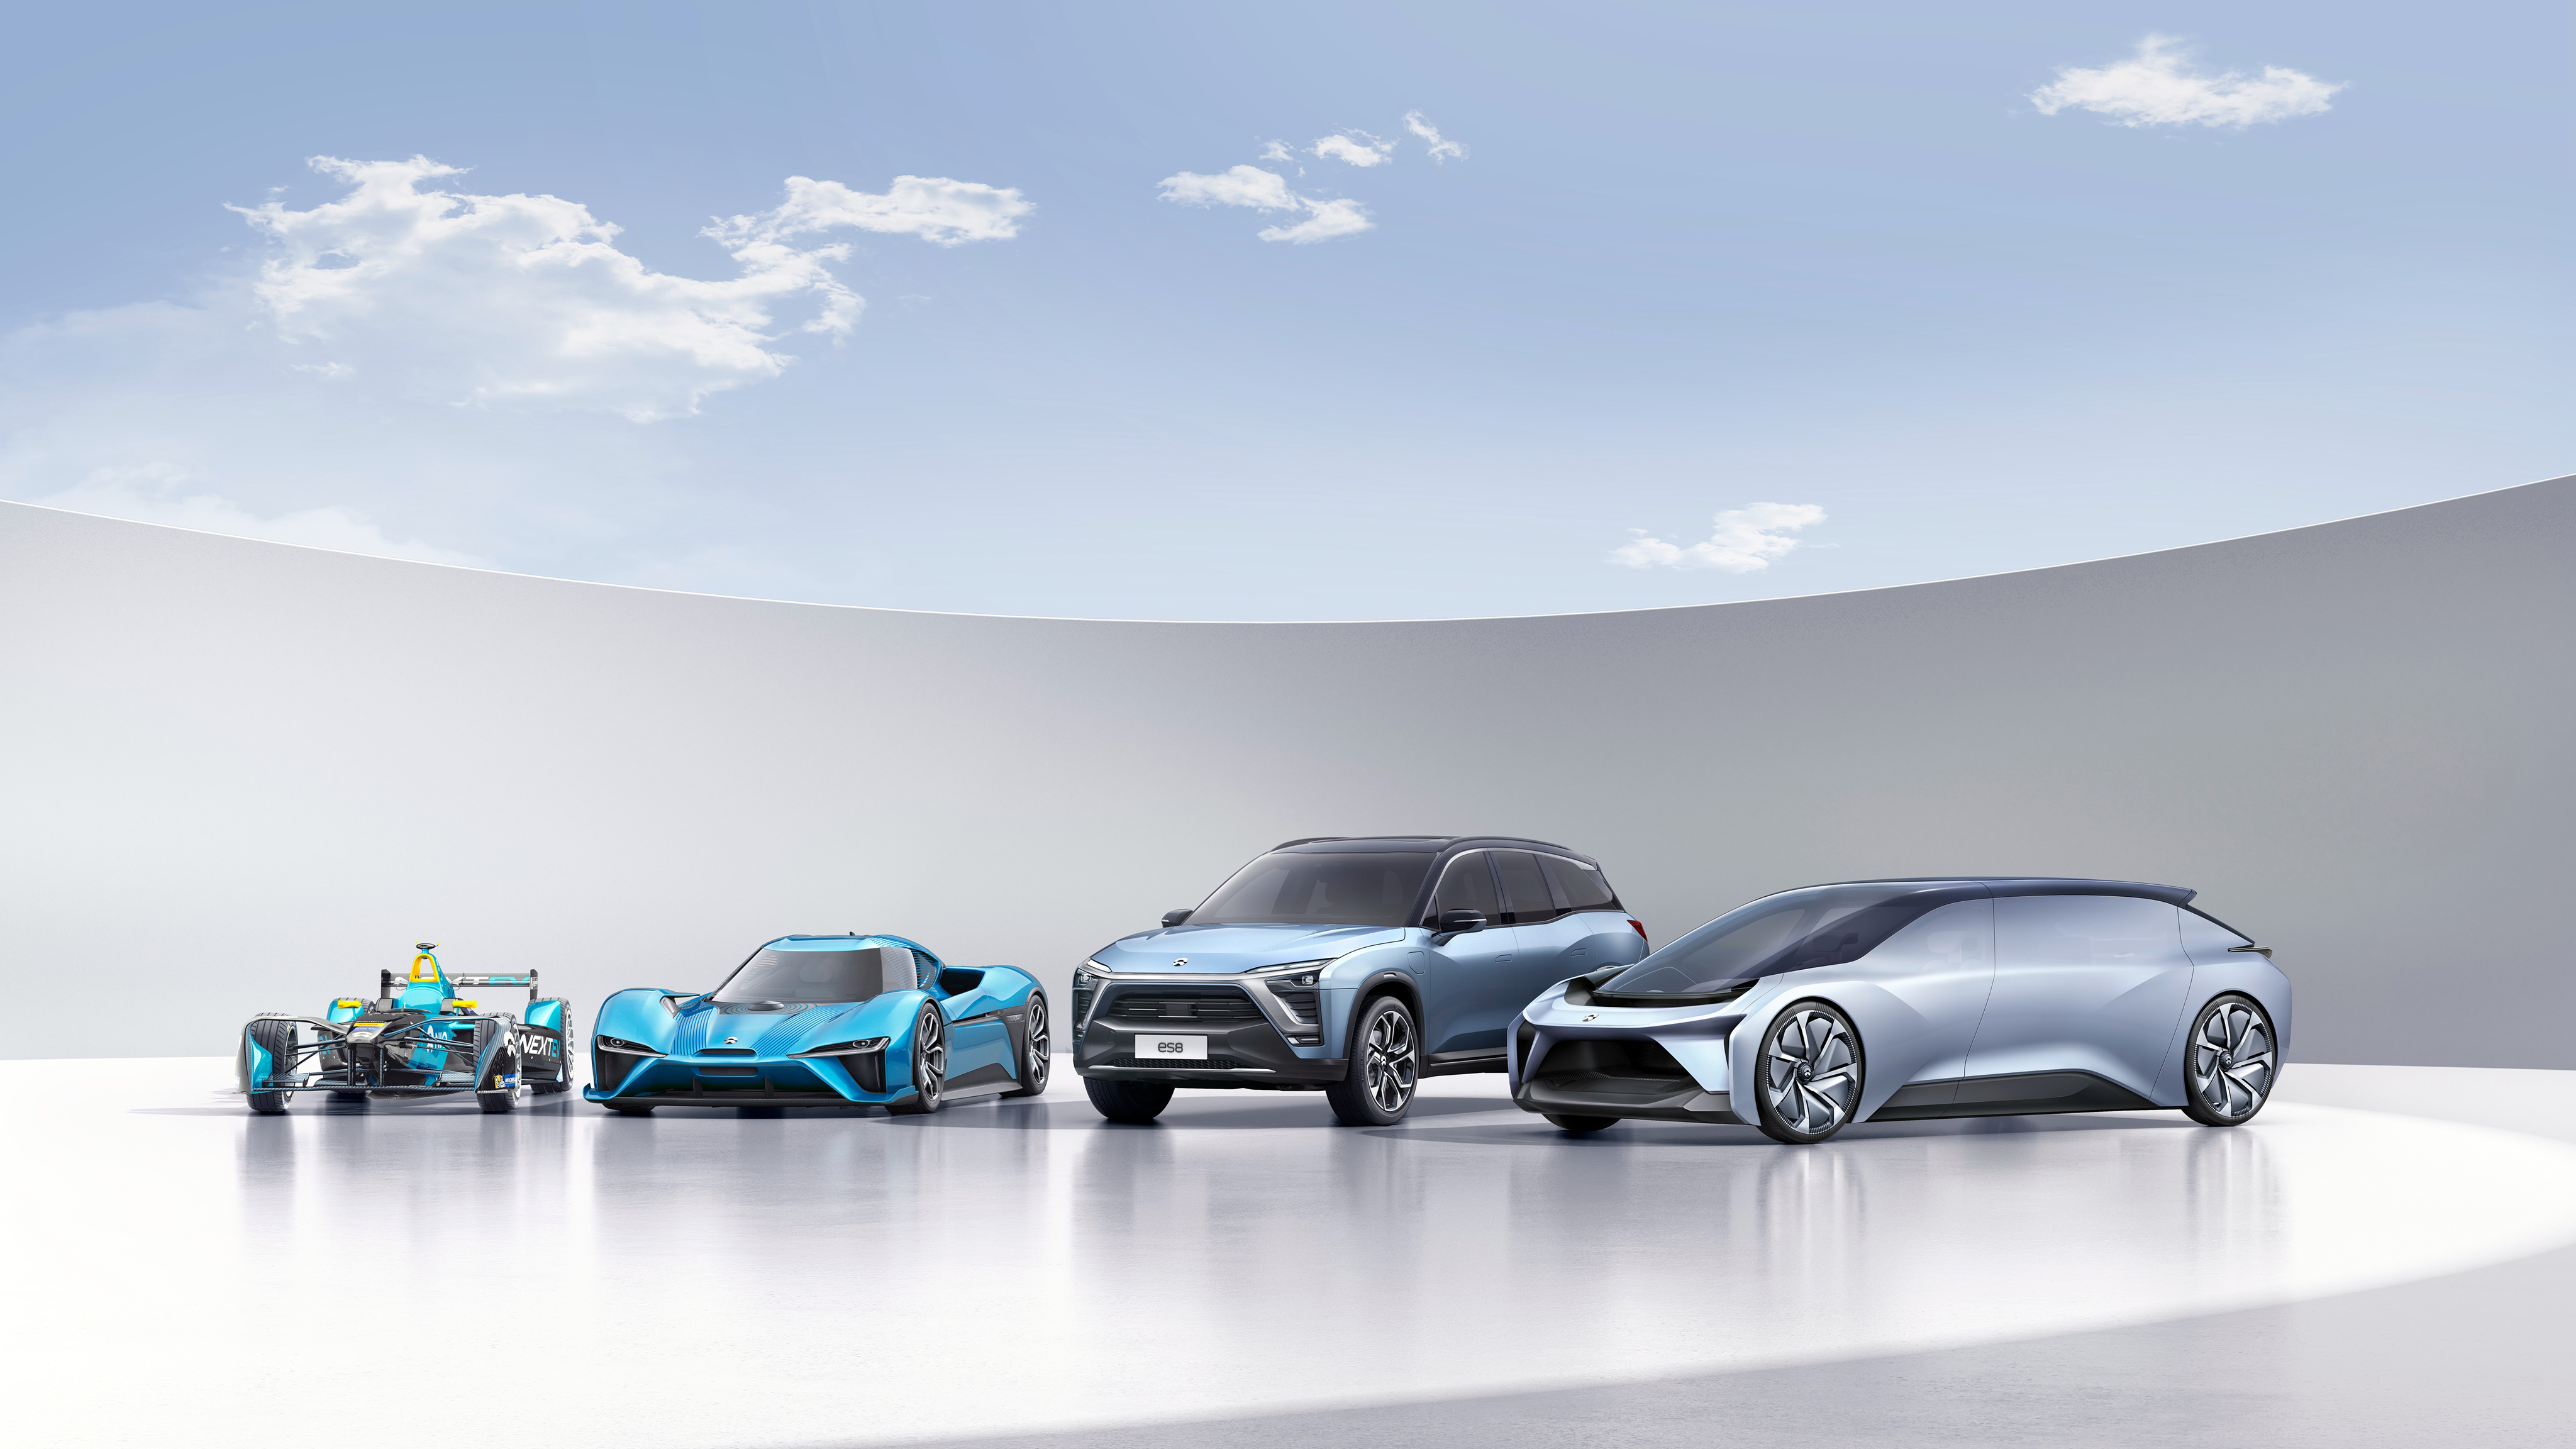 NextEV NIO Electric Cars 4K Wallpaper HD Car Wallpapers ID 7739 4096x2304